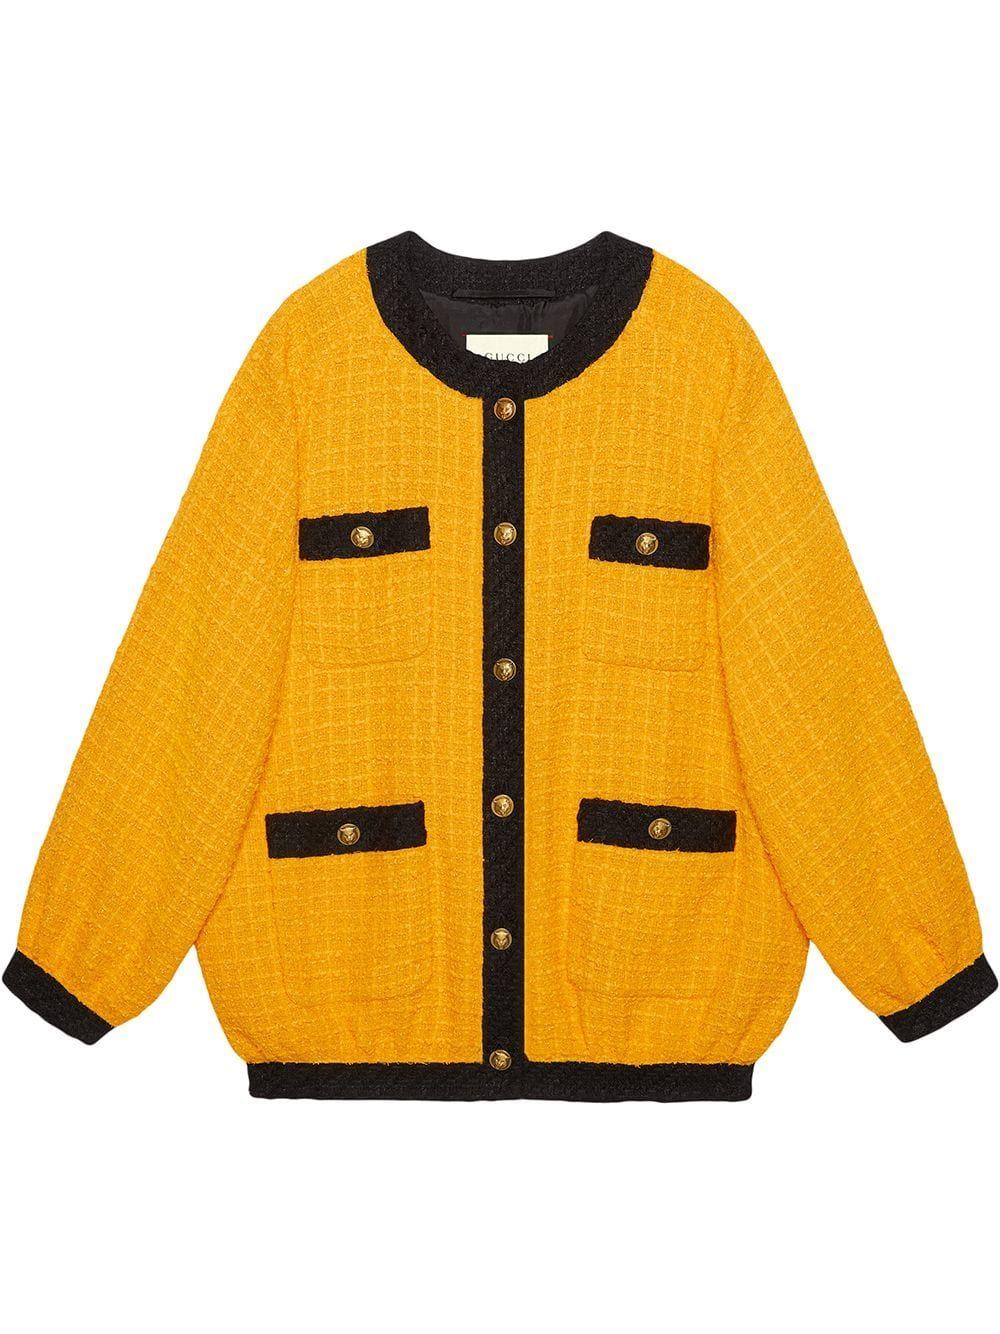 Gucci Oversize Tweed Bomber Jacket Farfetch Bomber Jacket Fashion Bomber Jacket Jackets [ 1334 x 1000 Pixel ]